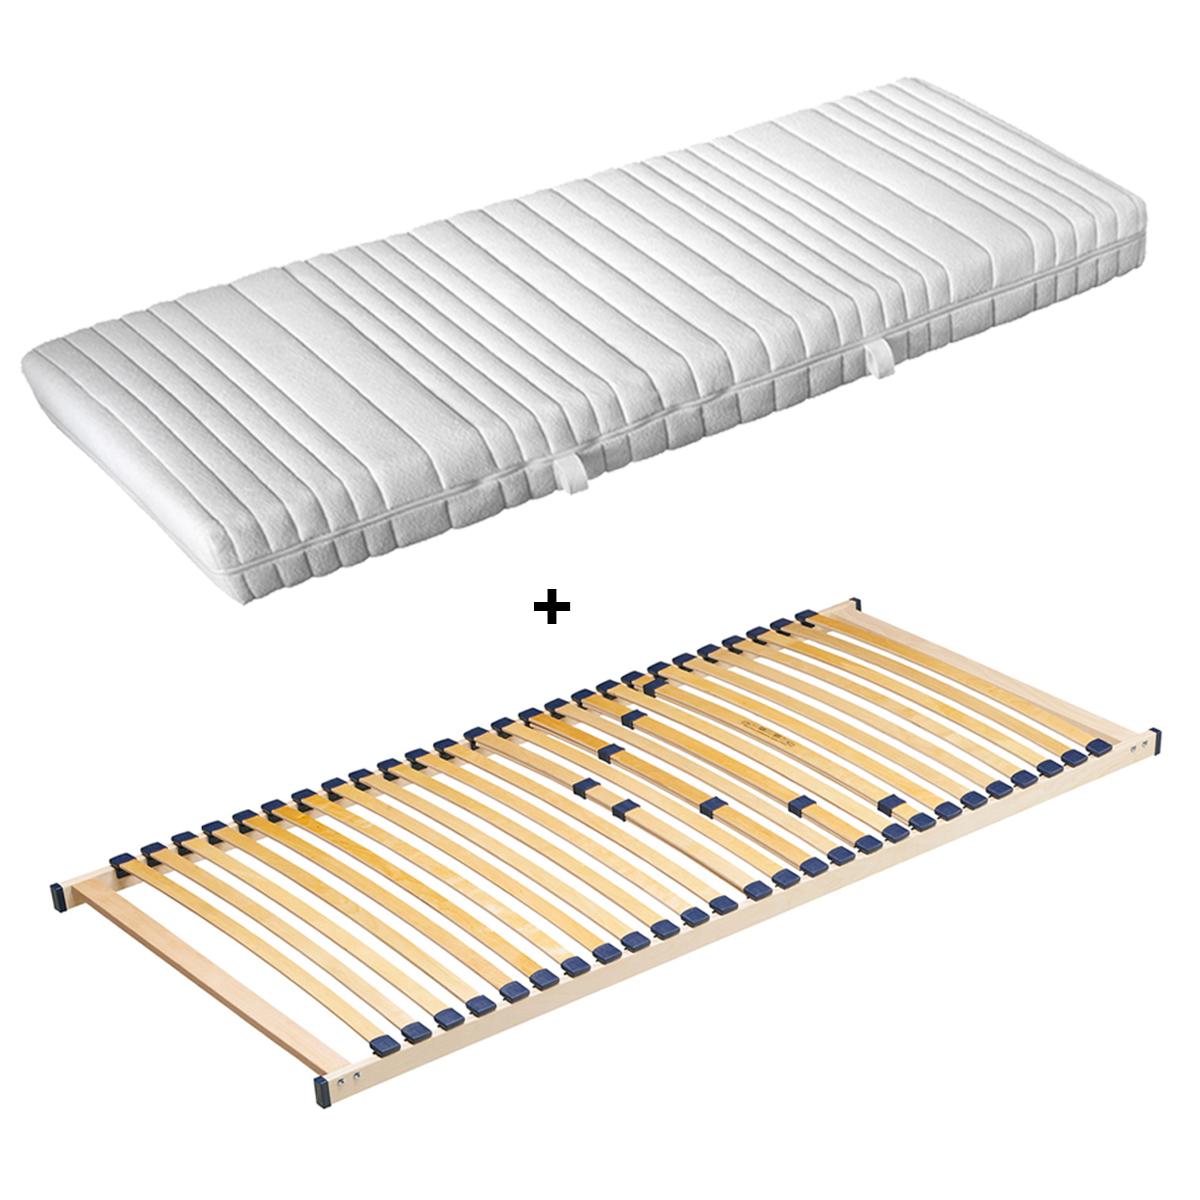 matratze speedy lattenrost 90x200 rubin lattenrahmen 26 leisten g nstiges set ebay. Black Bedroom Furniture Sets. Home Design Ideas